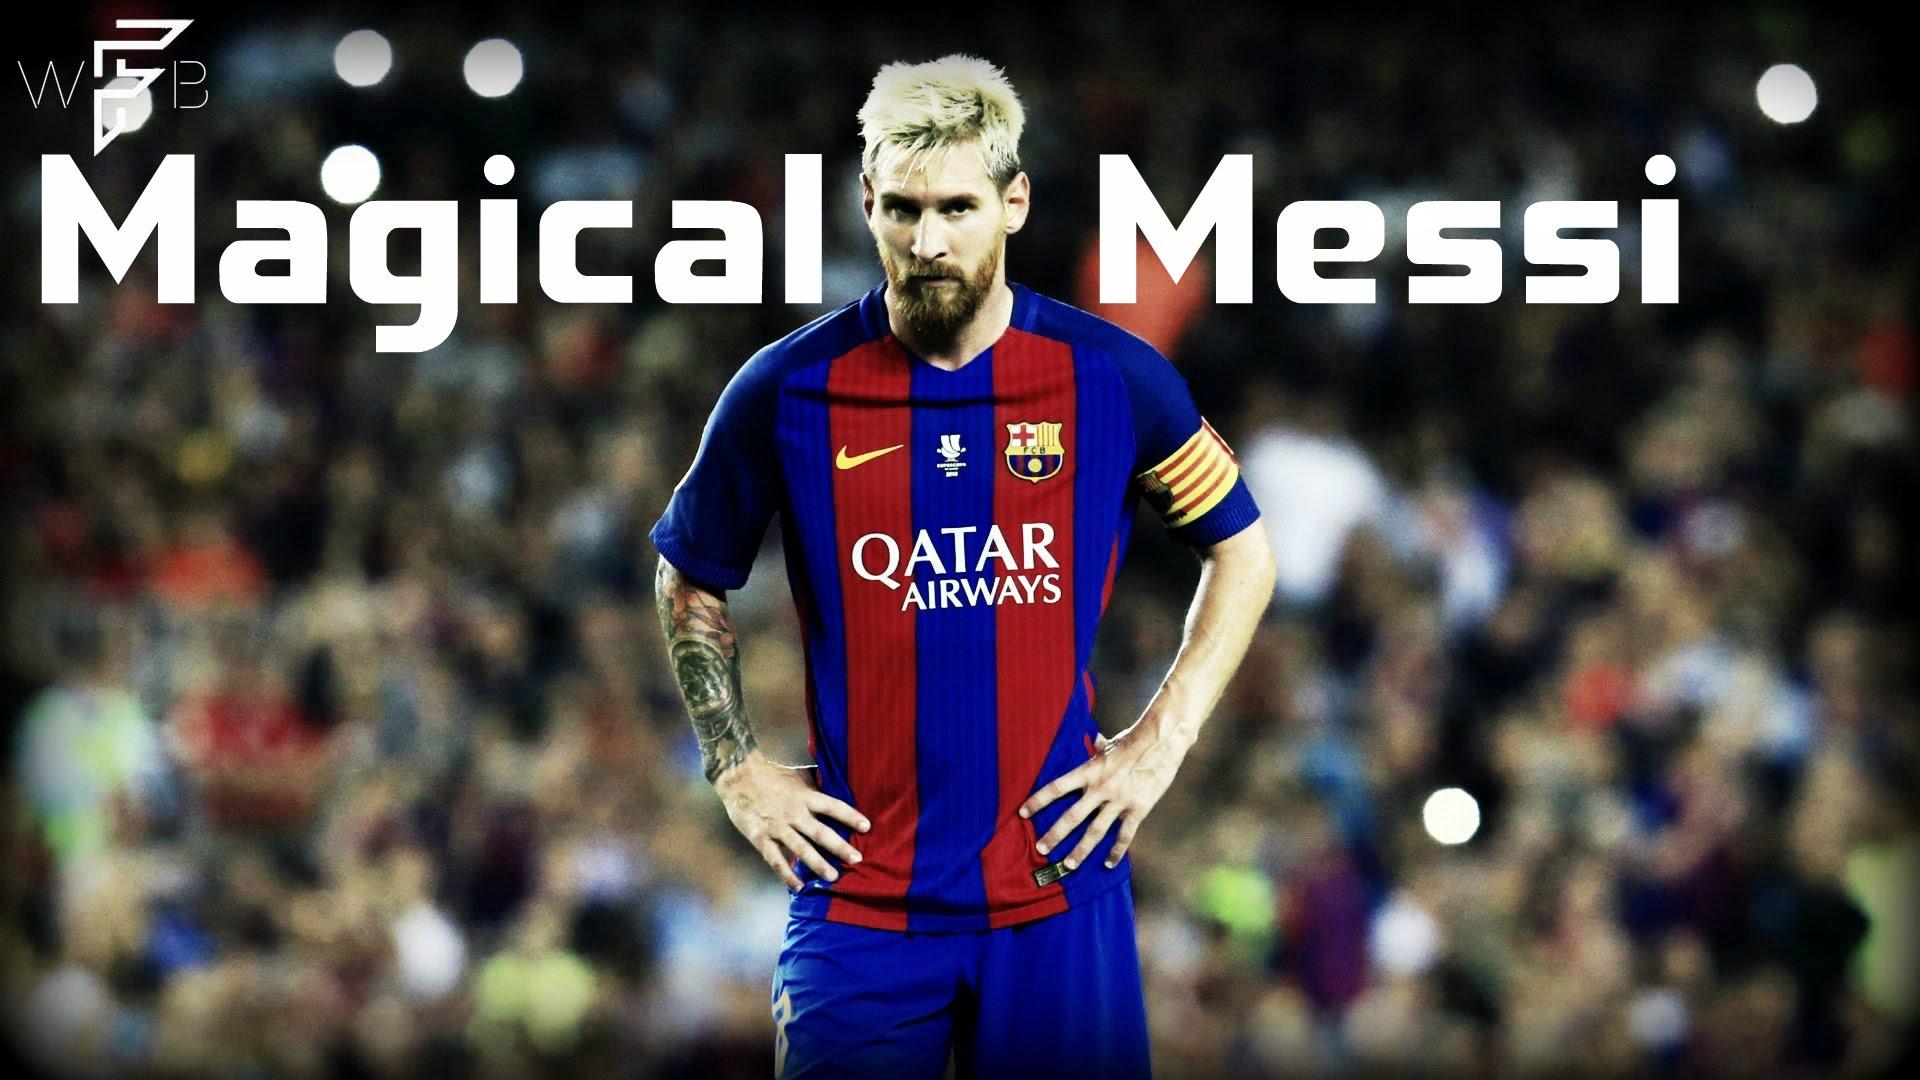 Barcelona Hd Wallpapers 2015 Lionel Messi Wallpapers Hd Download Free Pixelstalk Net